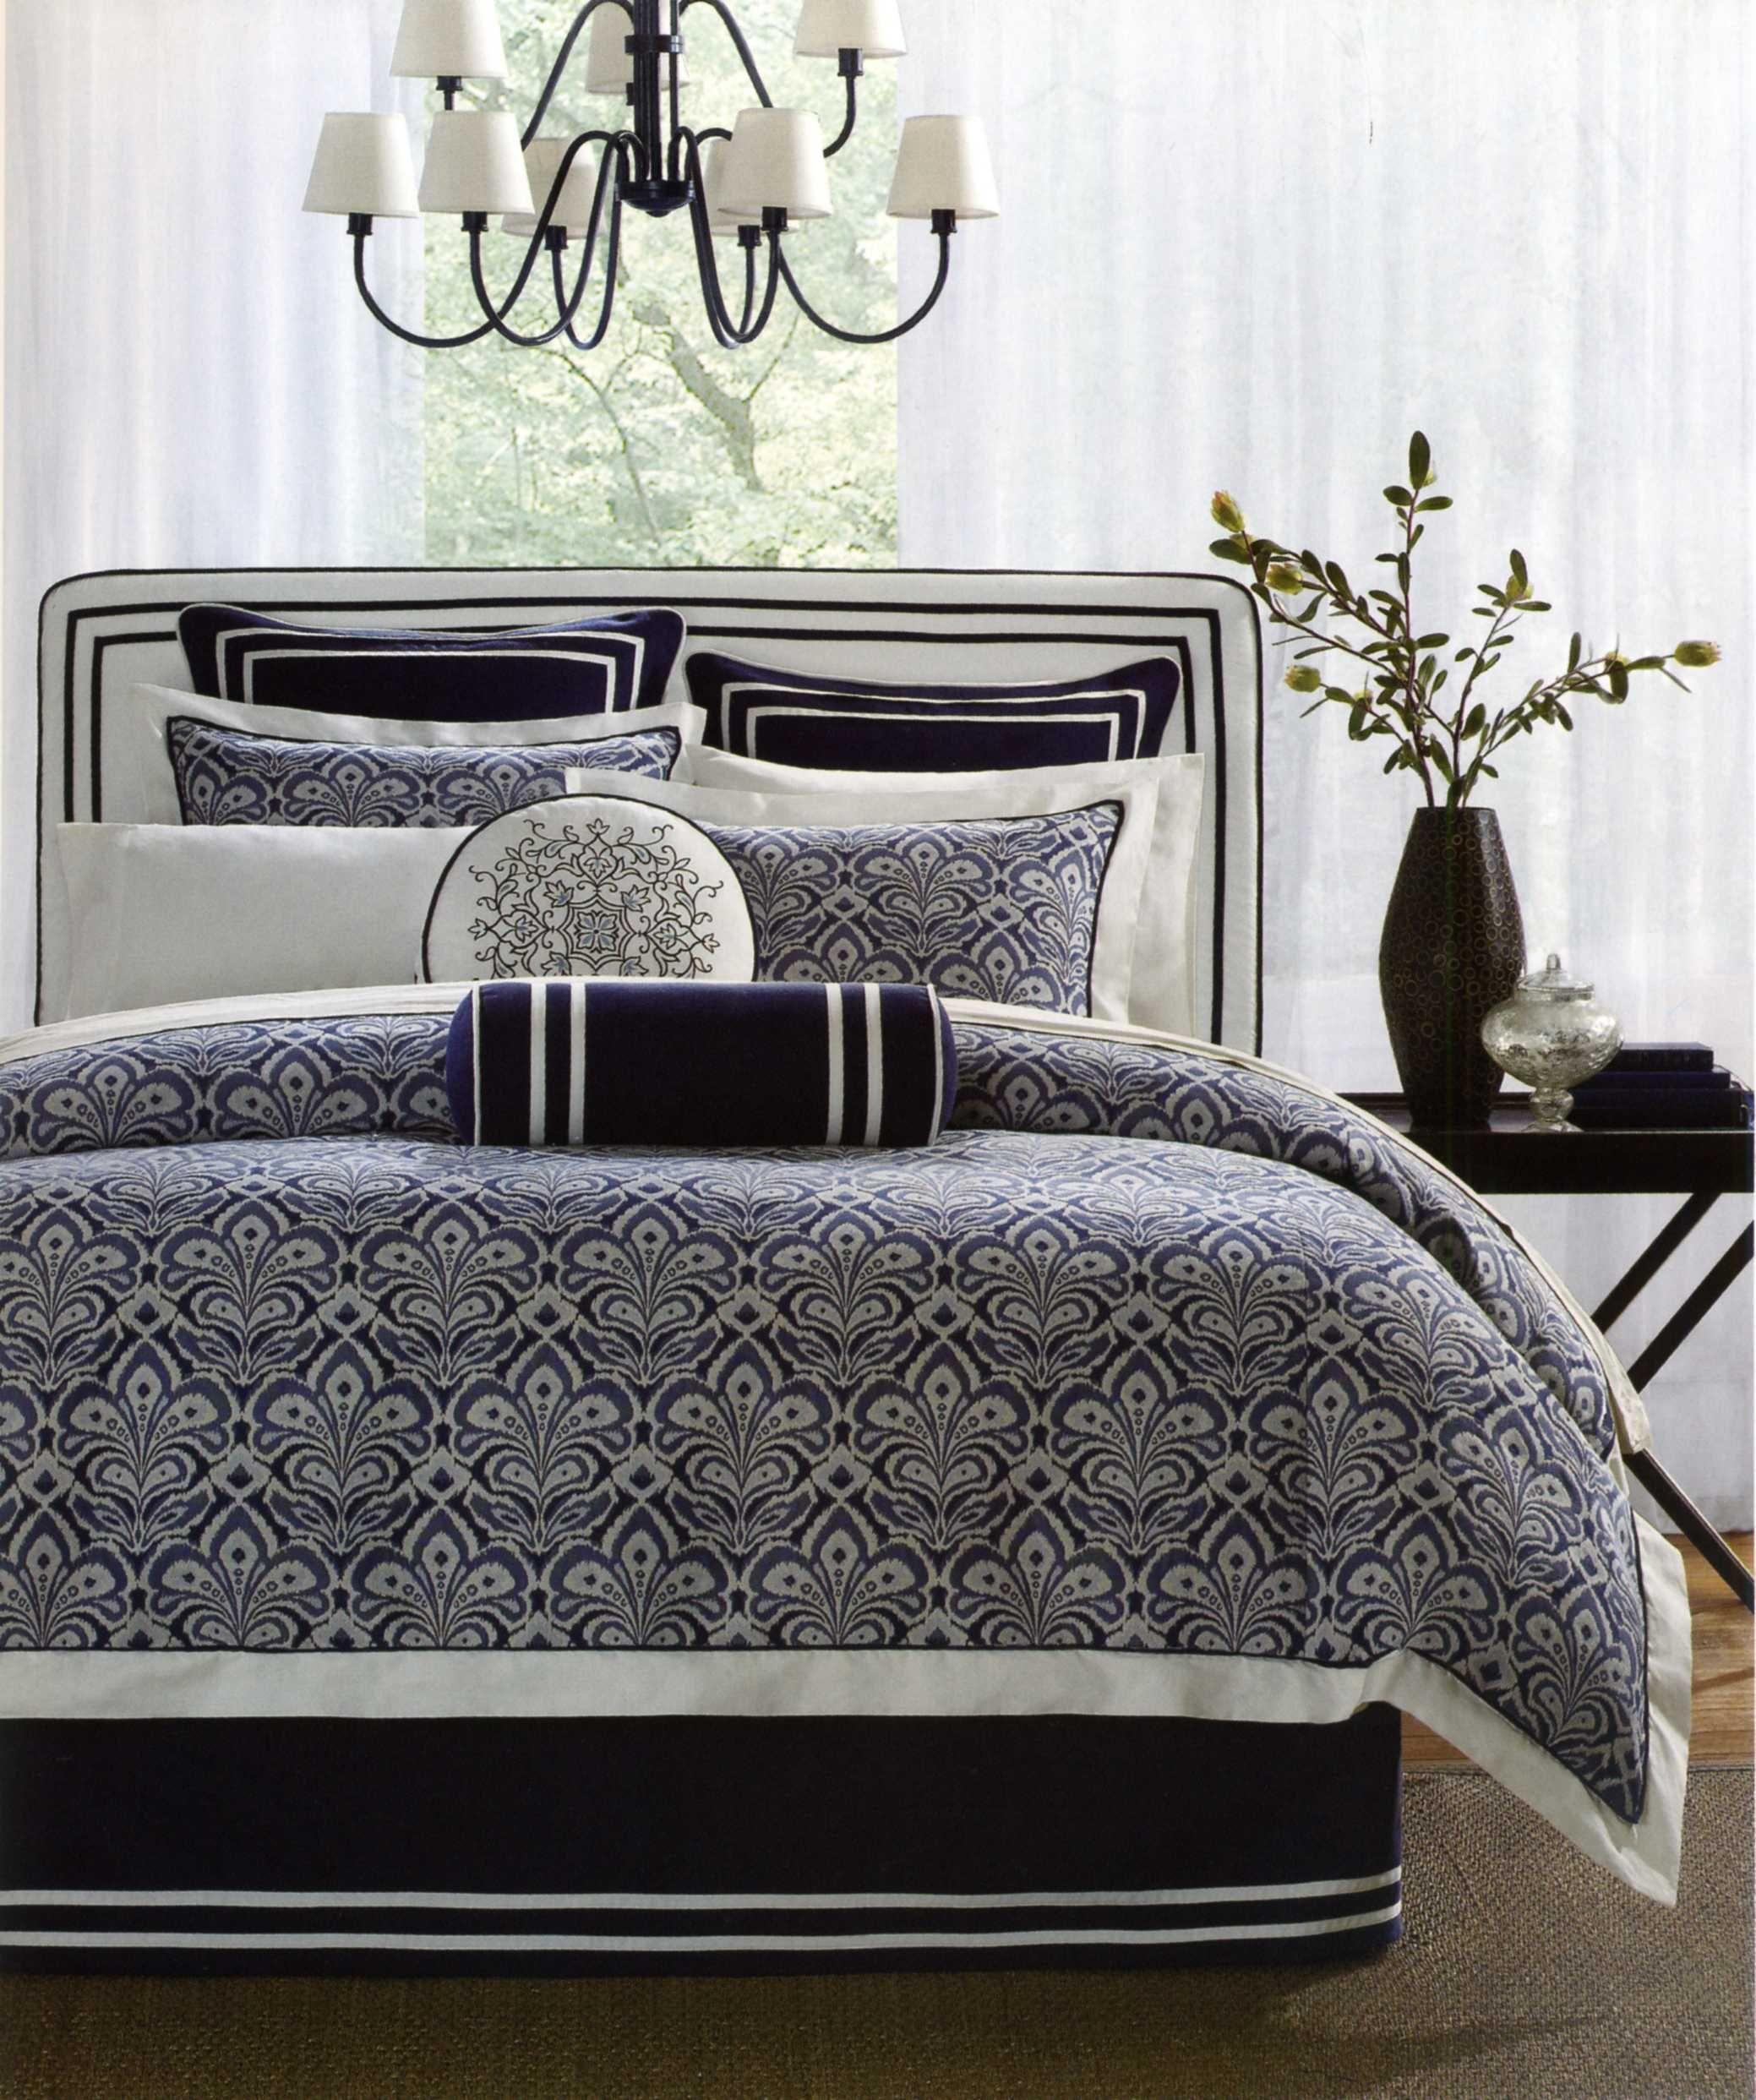 Laurel Hill Comforter Set Blue And White Bedding White Bed Set